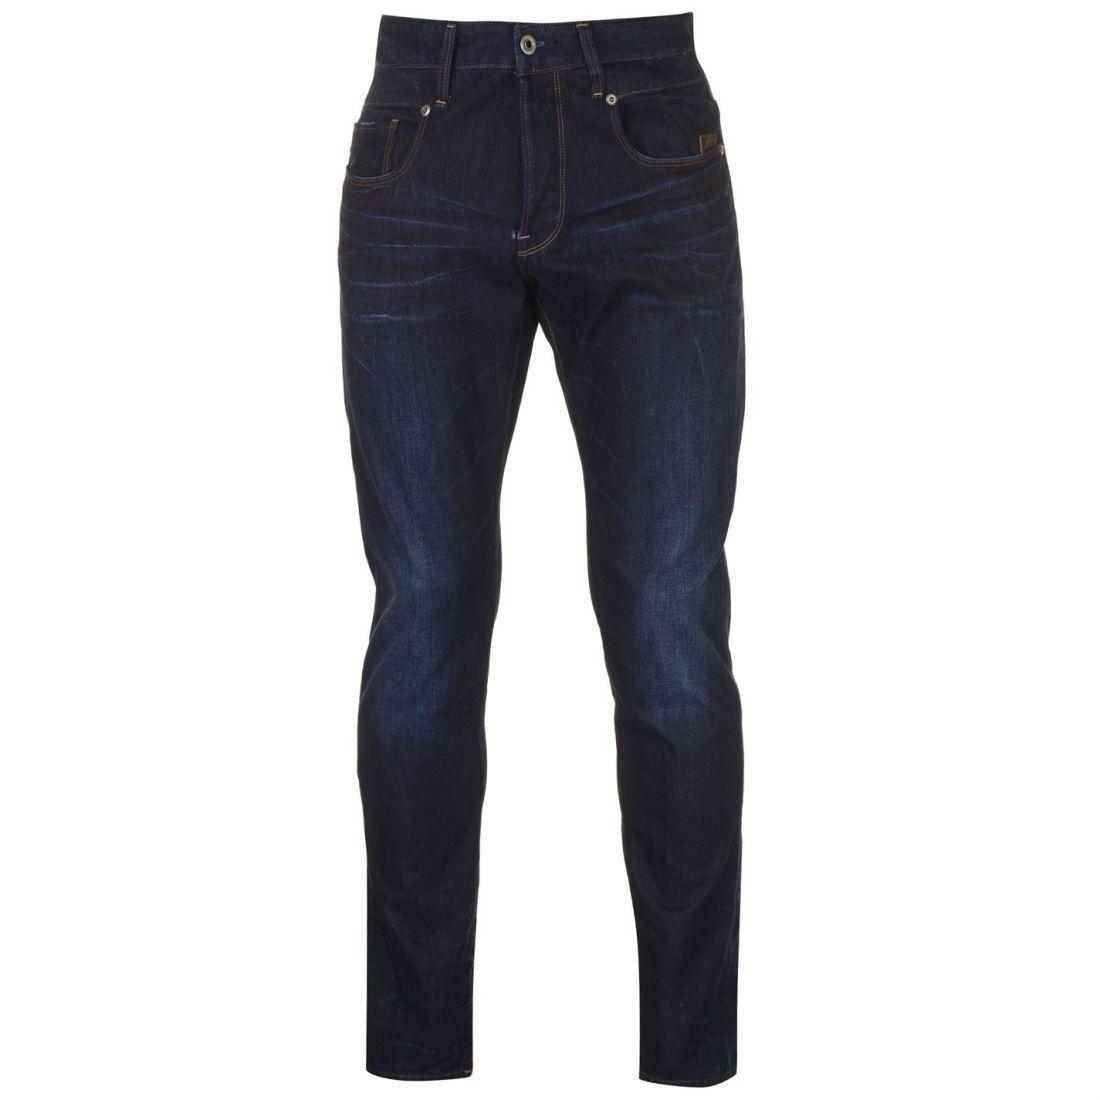 62b1e789015 G Star Mens Raw Radar Tapered Jeans Straight Pants Trousers ...